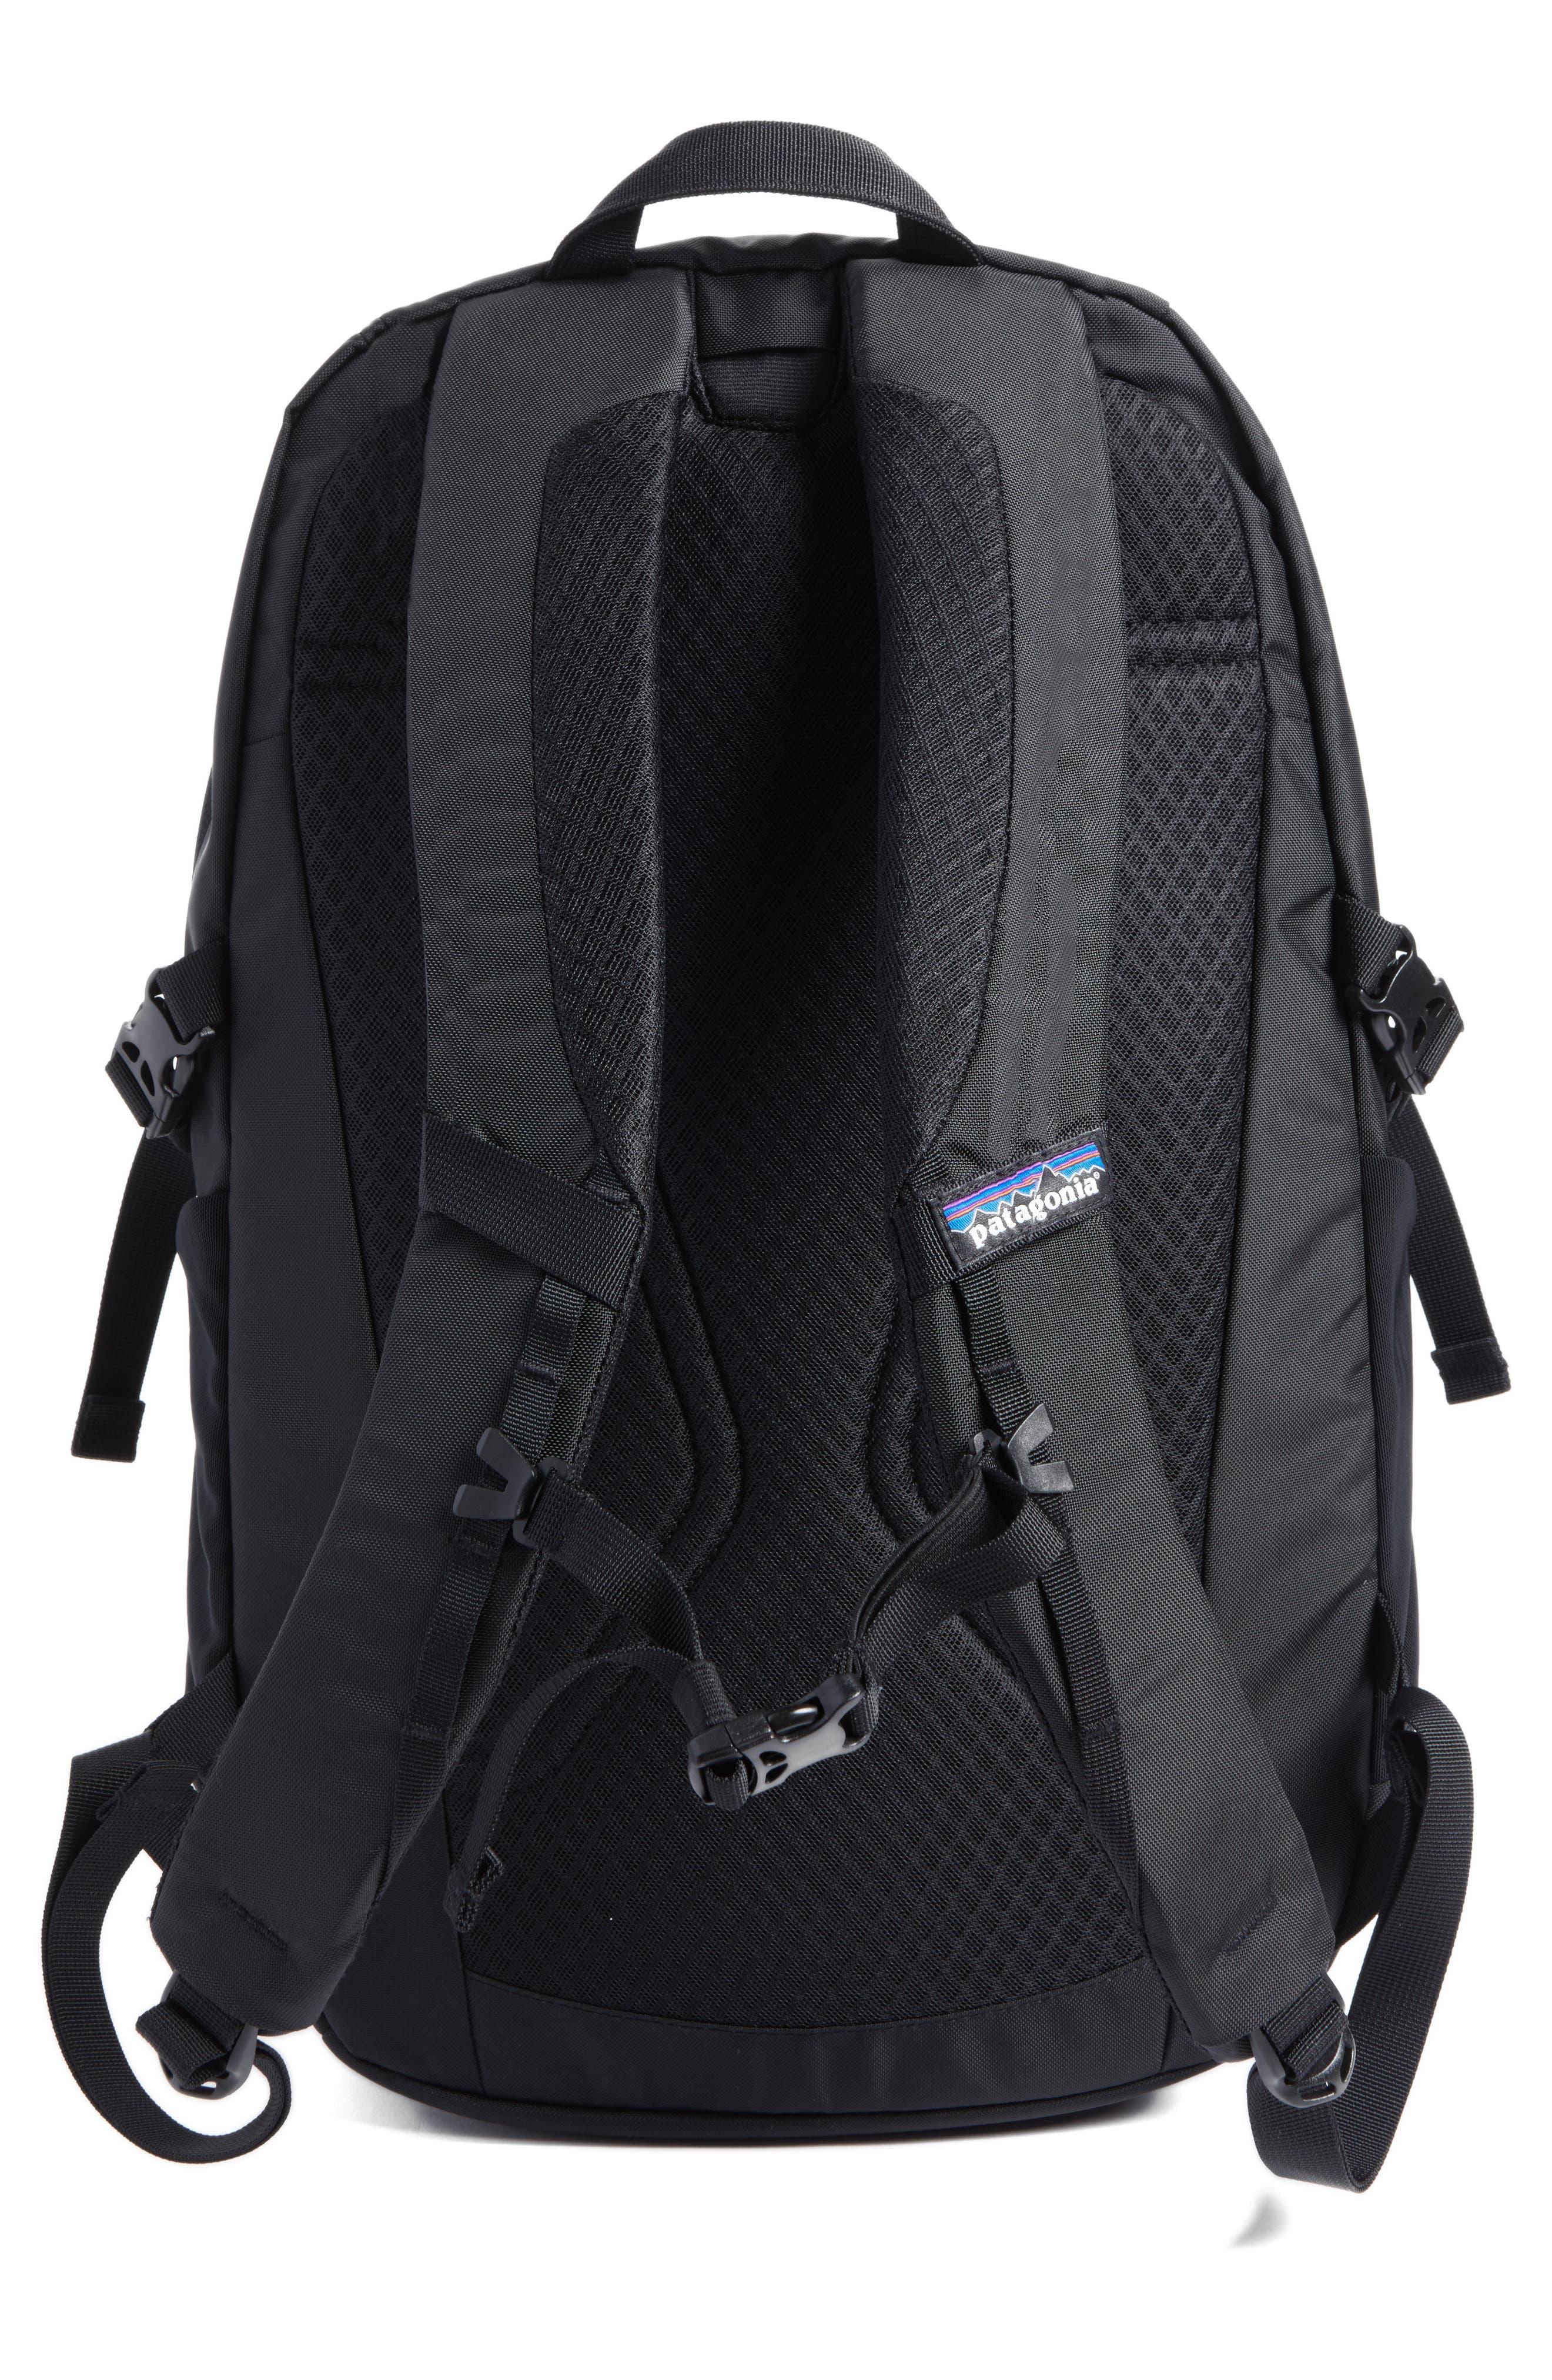 PATAGONIA, Refugio 26L Backpack, Alternate thumbnail 4, color, BLACK